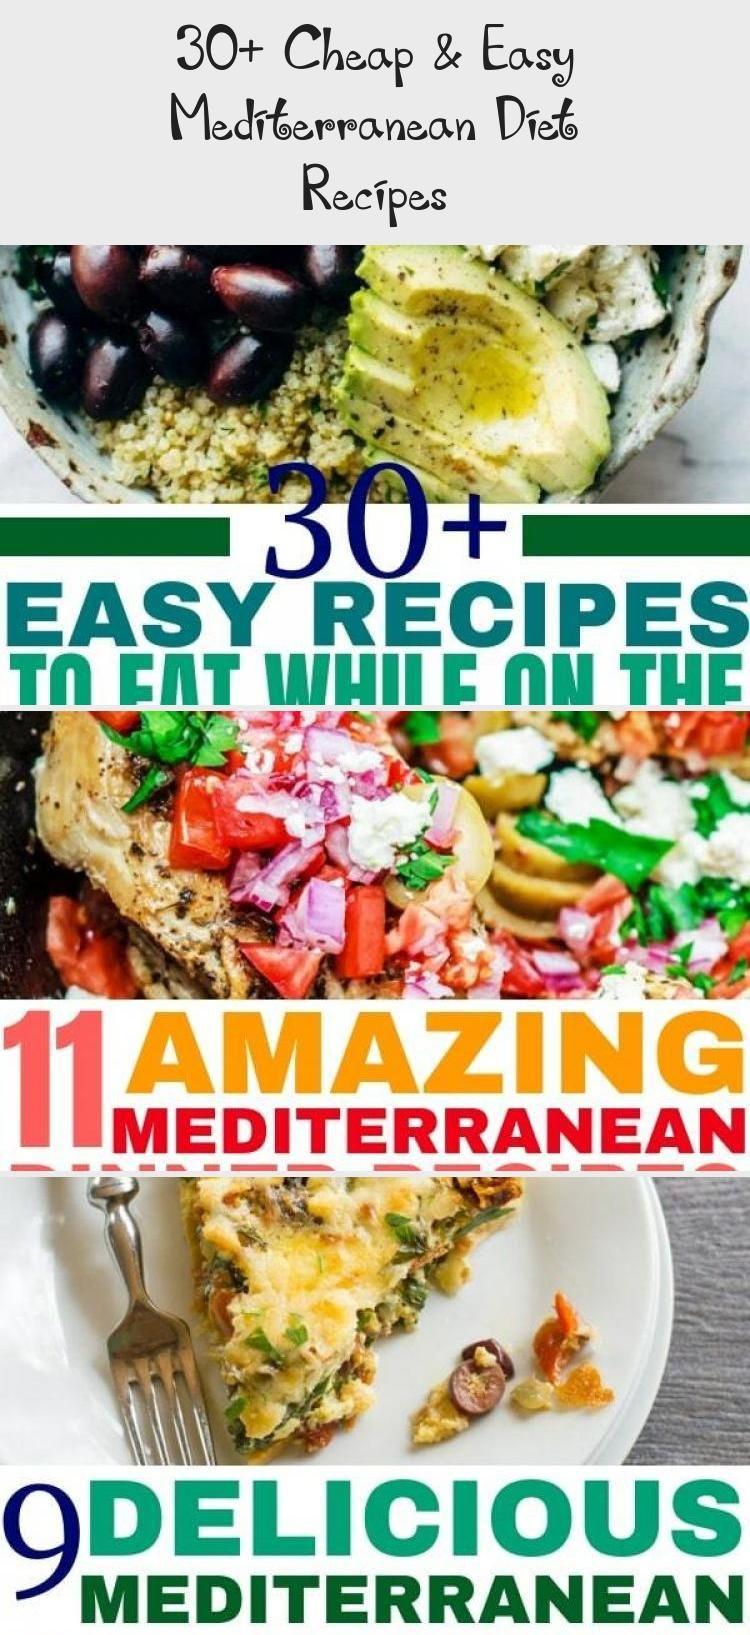 30 Cheap Easy Mediterranean Diet Recipes Easy Mediterranean Diet Recipes Mediterranean Diet Recipes Recipes